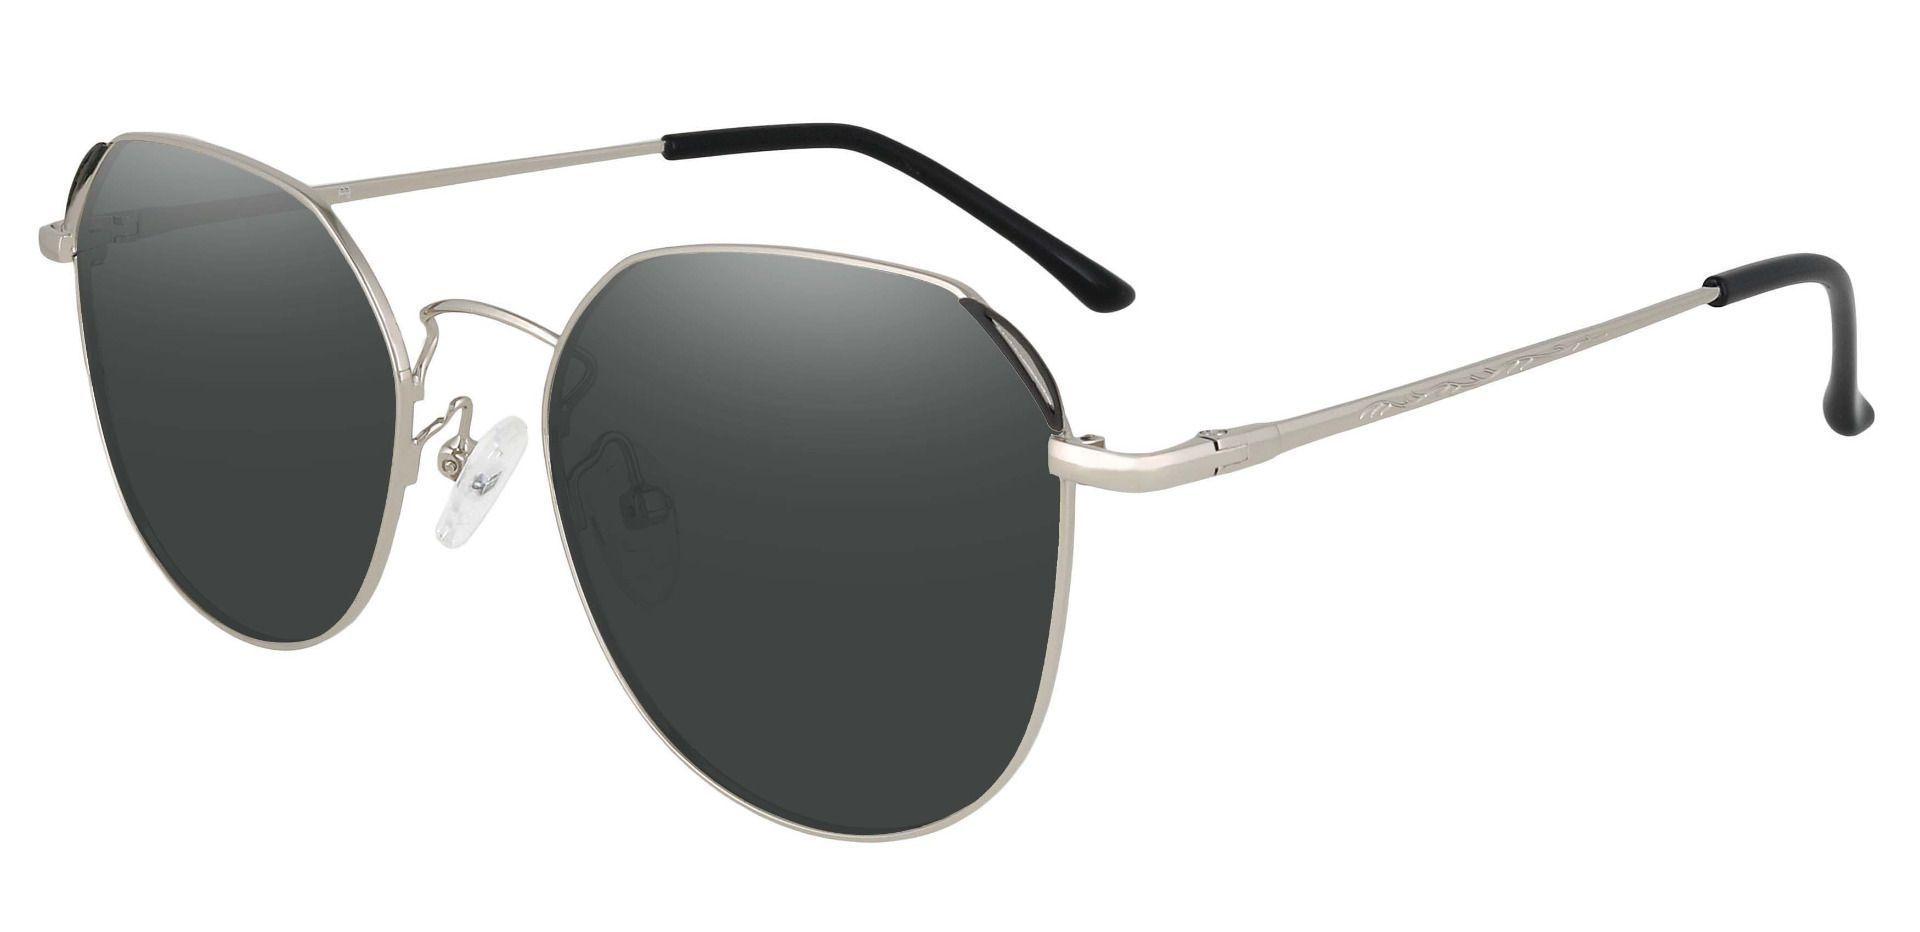 Figaro Geometric Progressive Sunglasses - Silver Frame With Gray Lenses